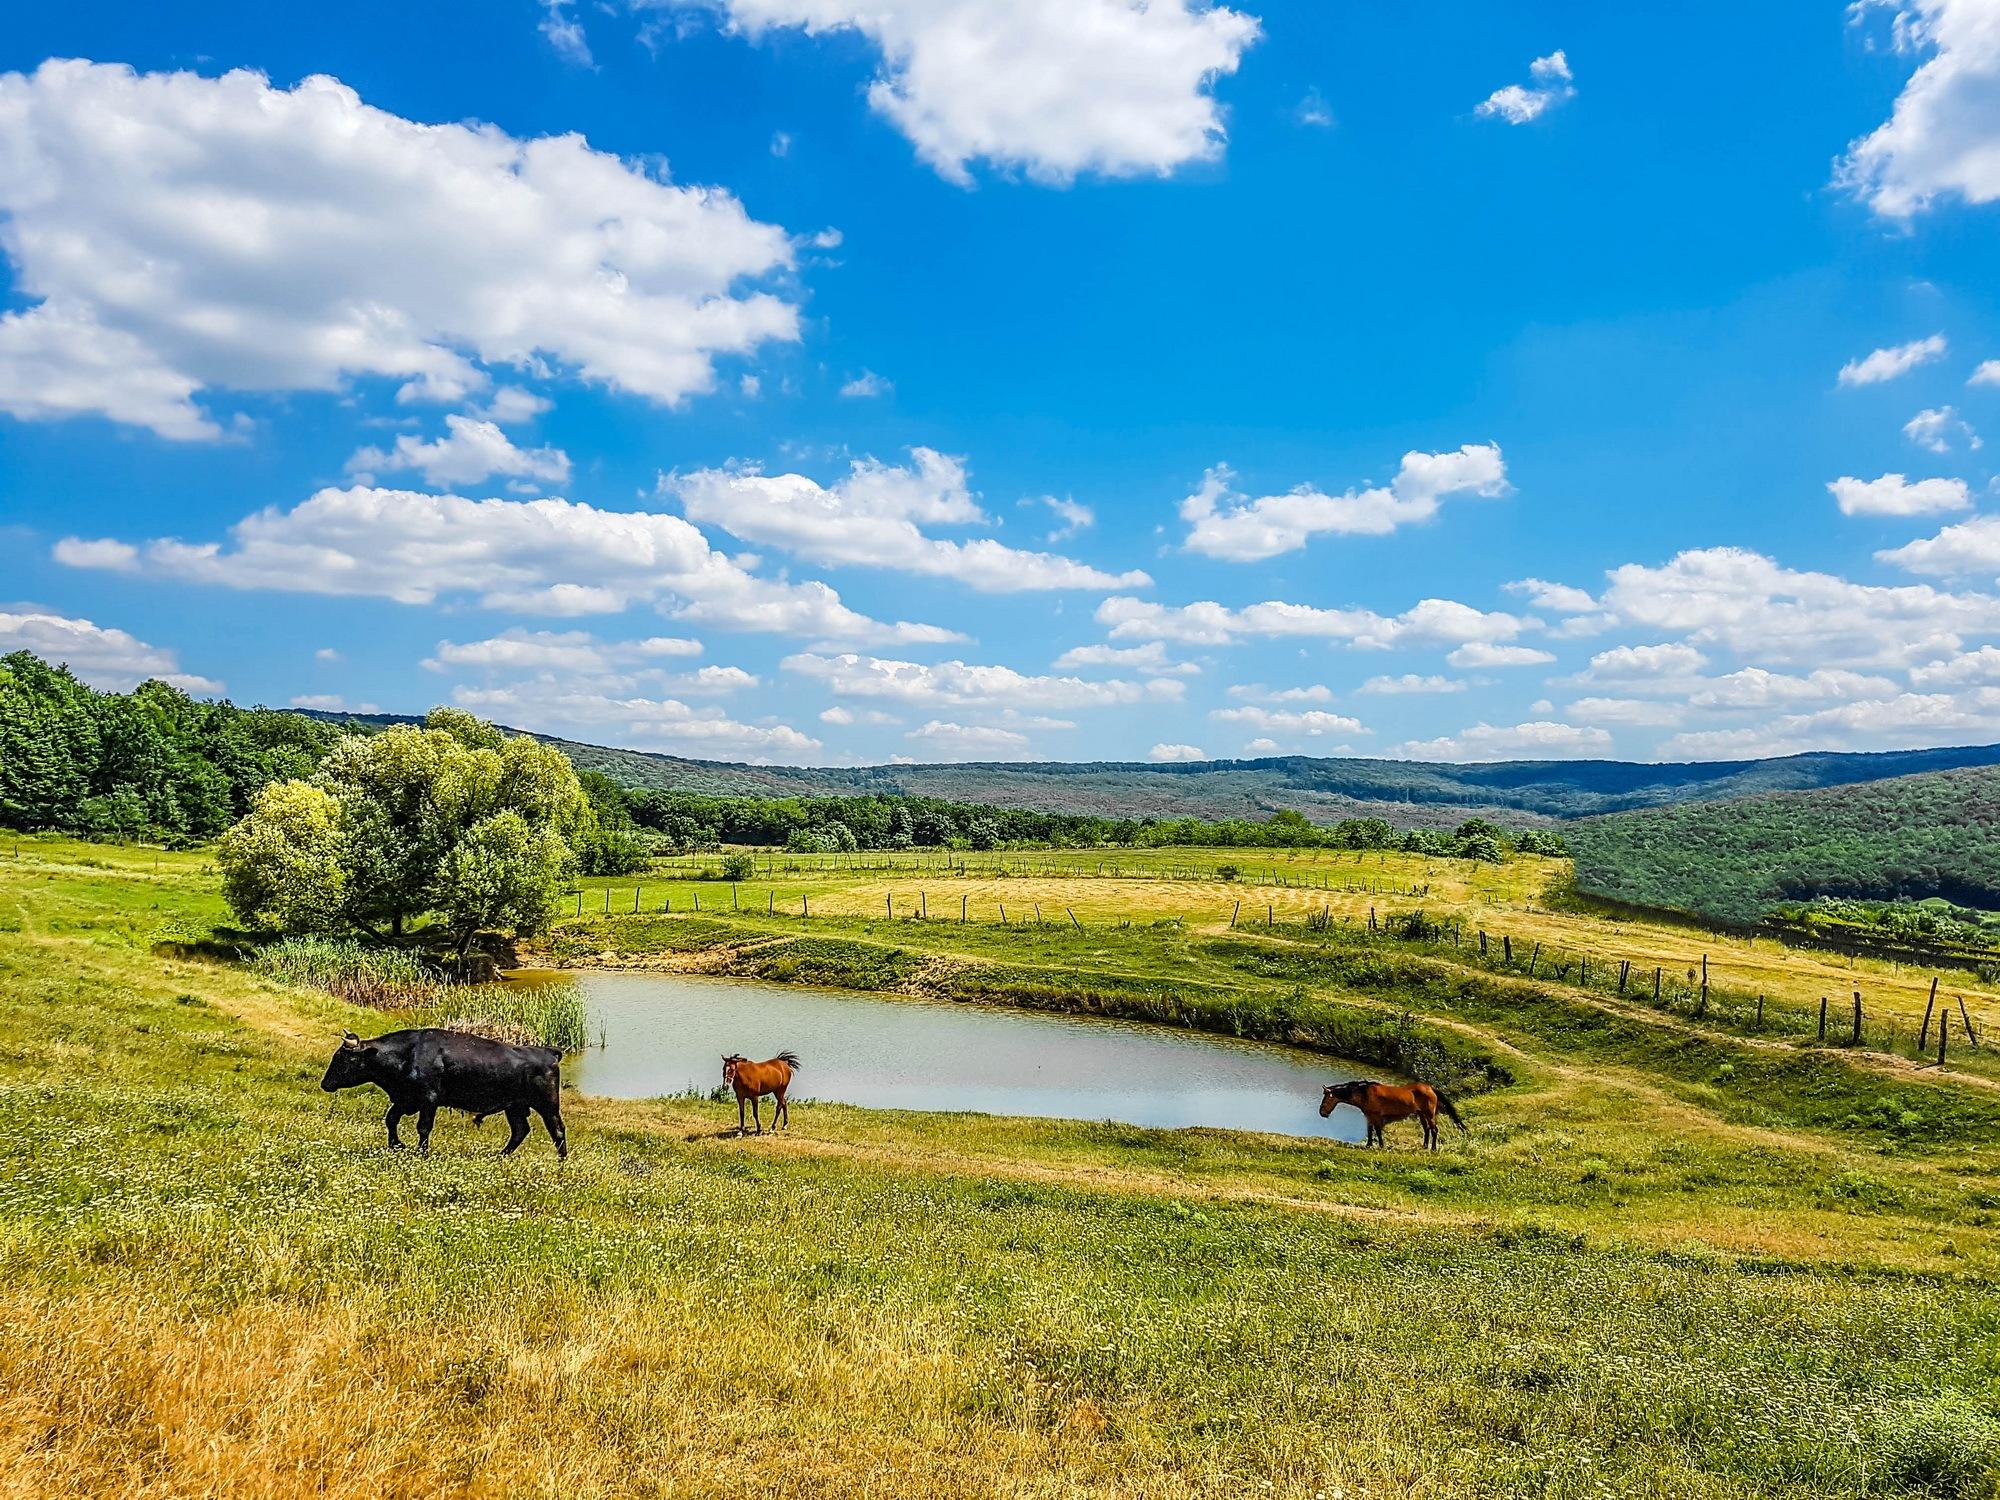 Bull, horses and the beautiful Barnova Place  by EnacheArmandIustinian